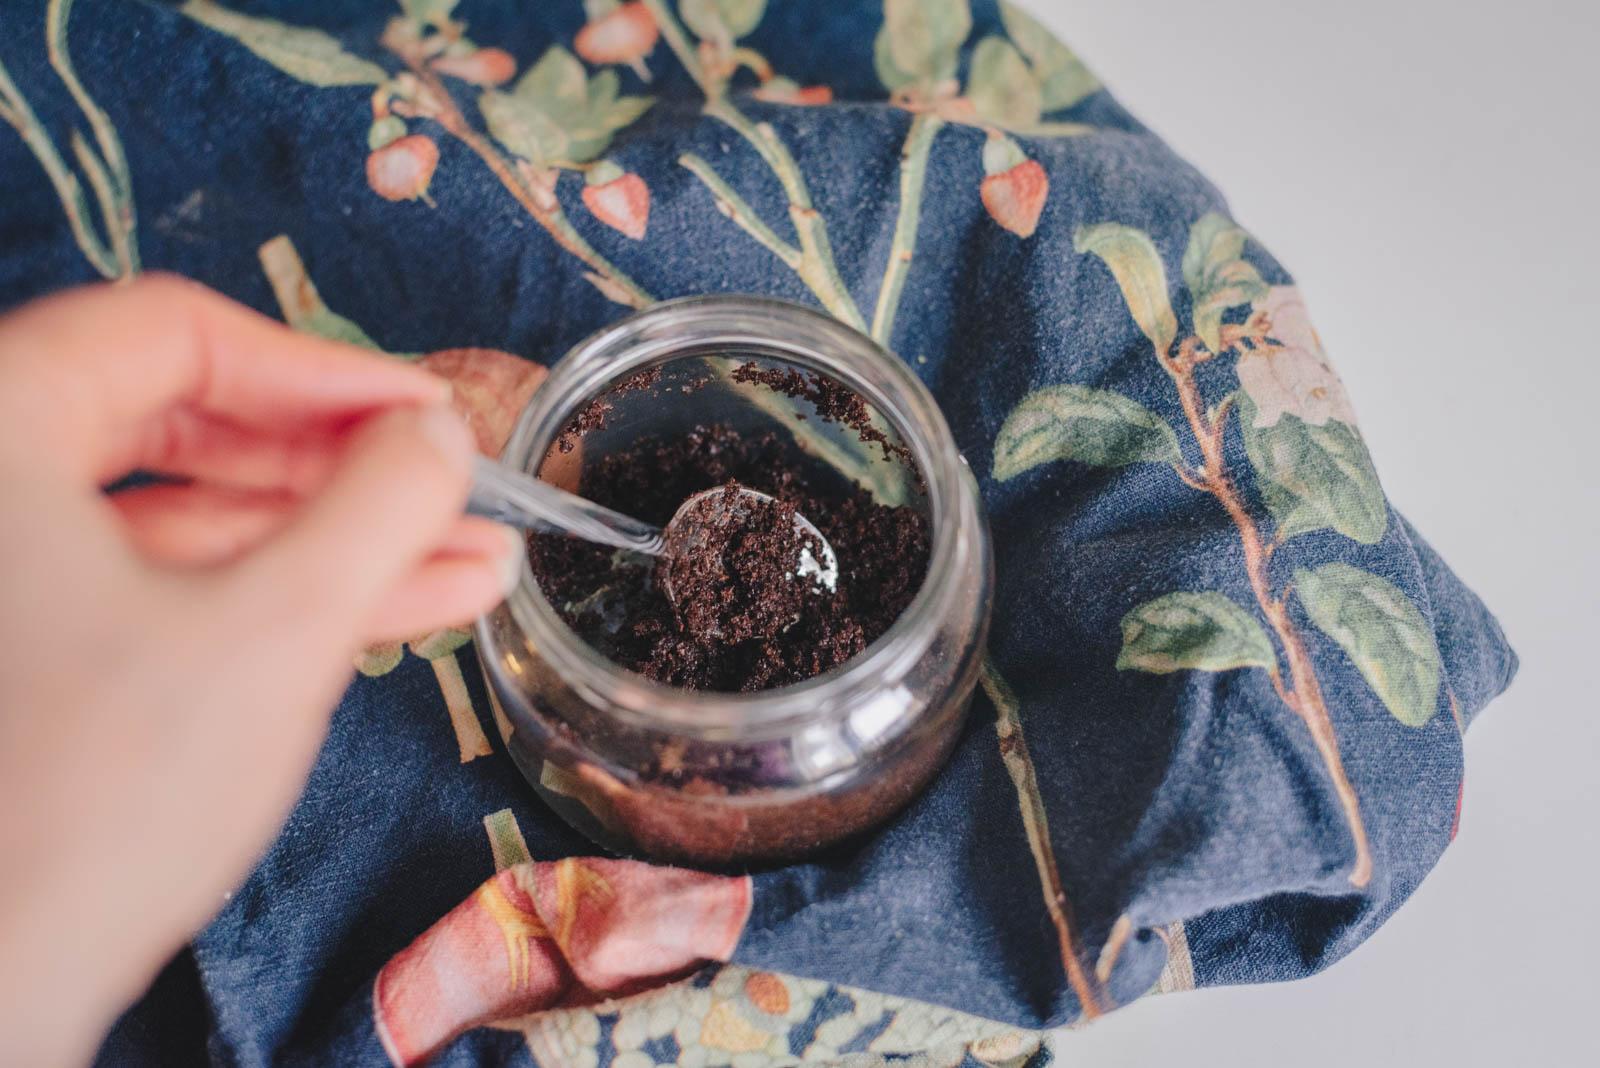 kahvinpuru kuorinta iho